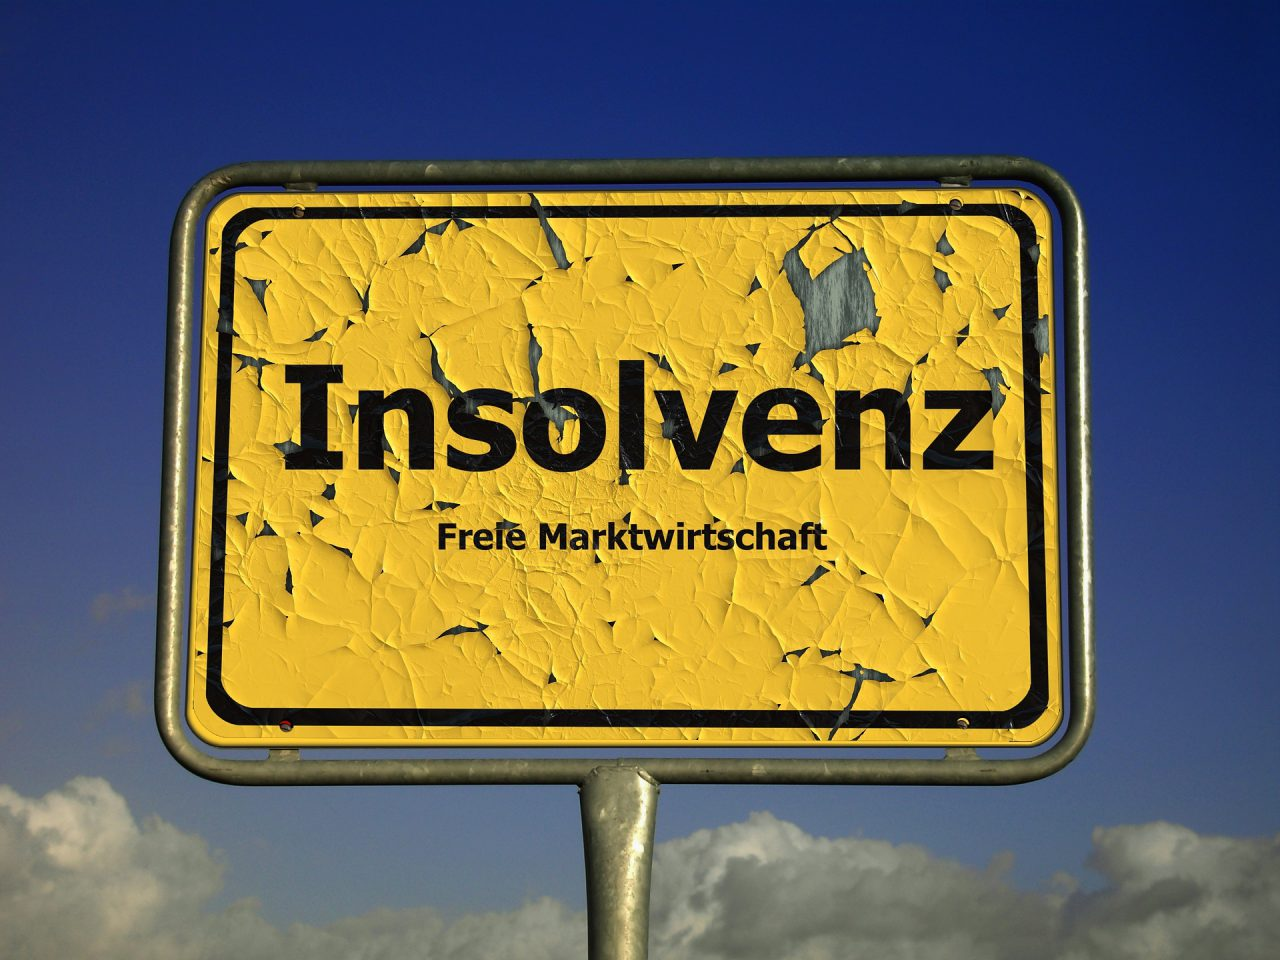 https://janine-hardi.com/wp-content/uploads/2020/04/insolvency-593750_1920-1280x960.jpg